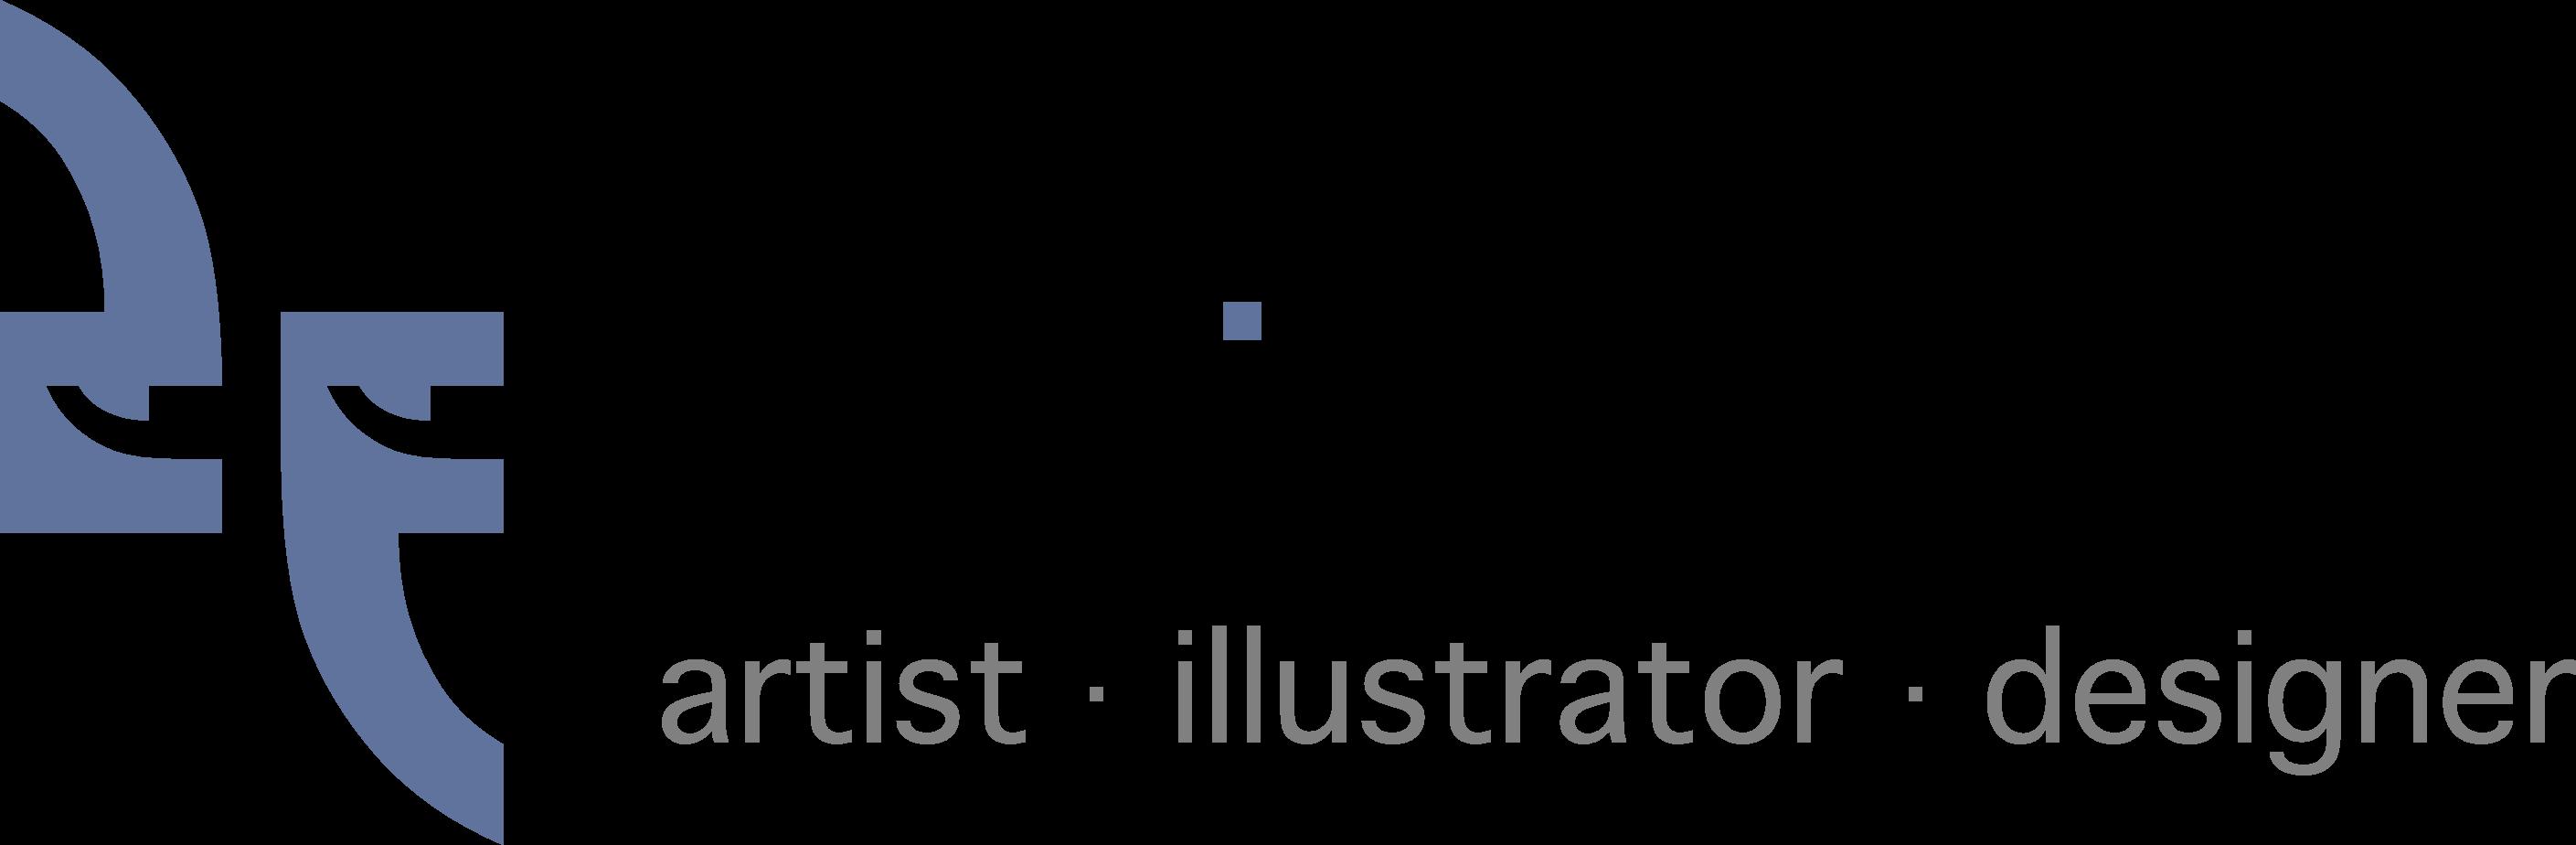 Daniel Petrov | artist, illustrator, designer